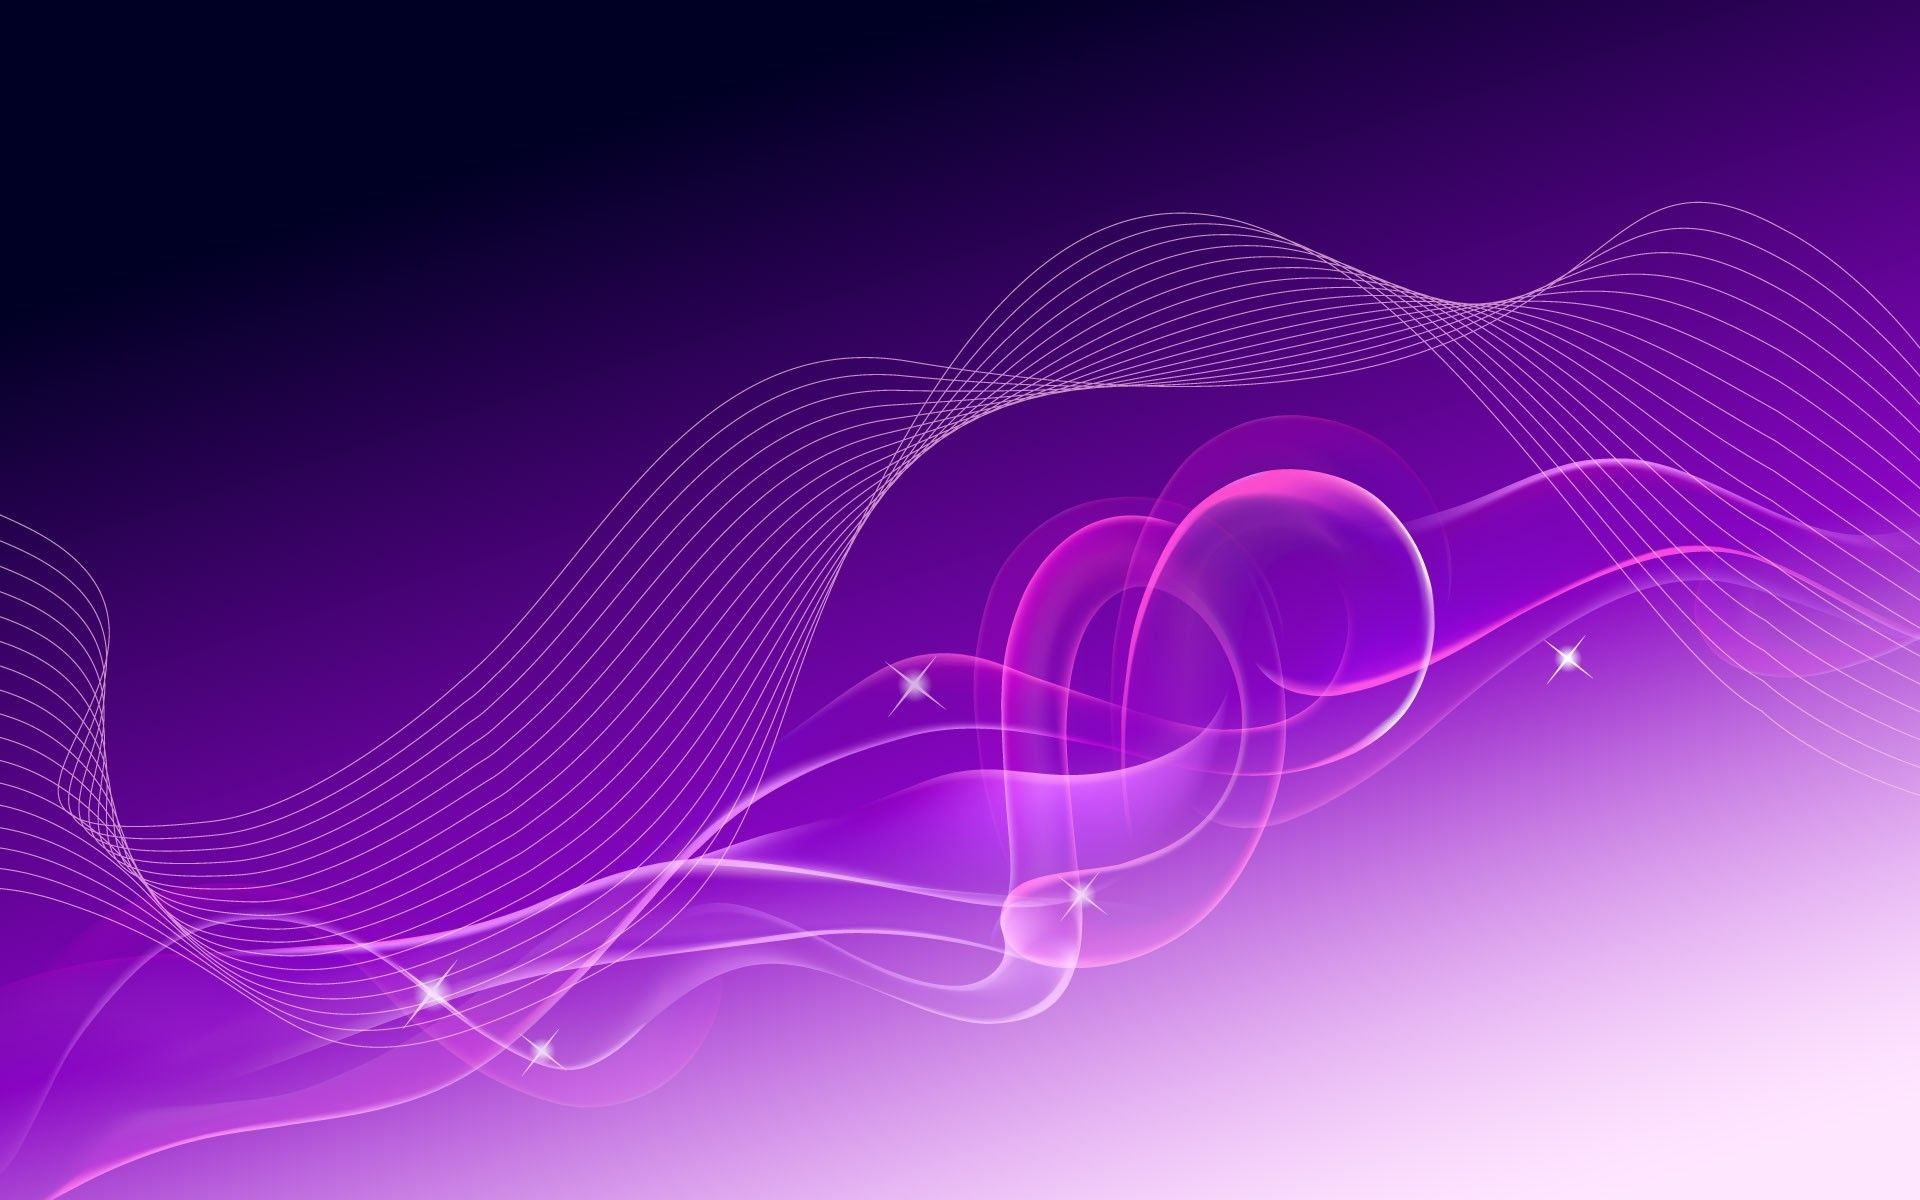 purple design backgrounds 39 images